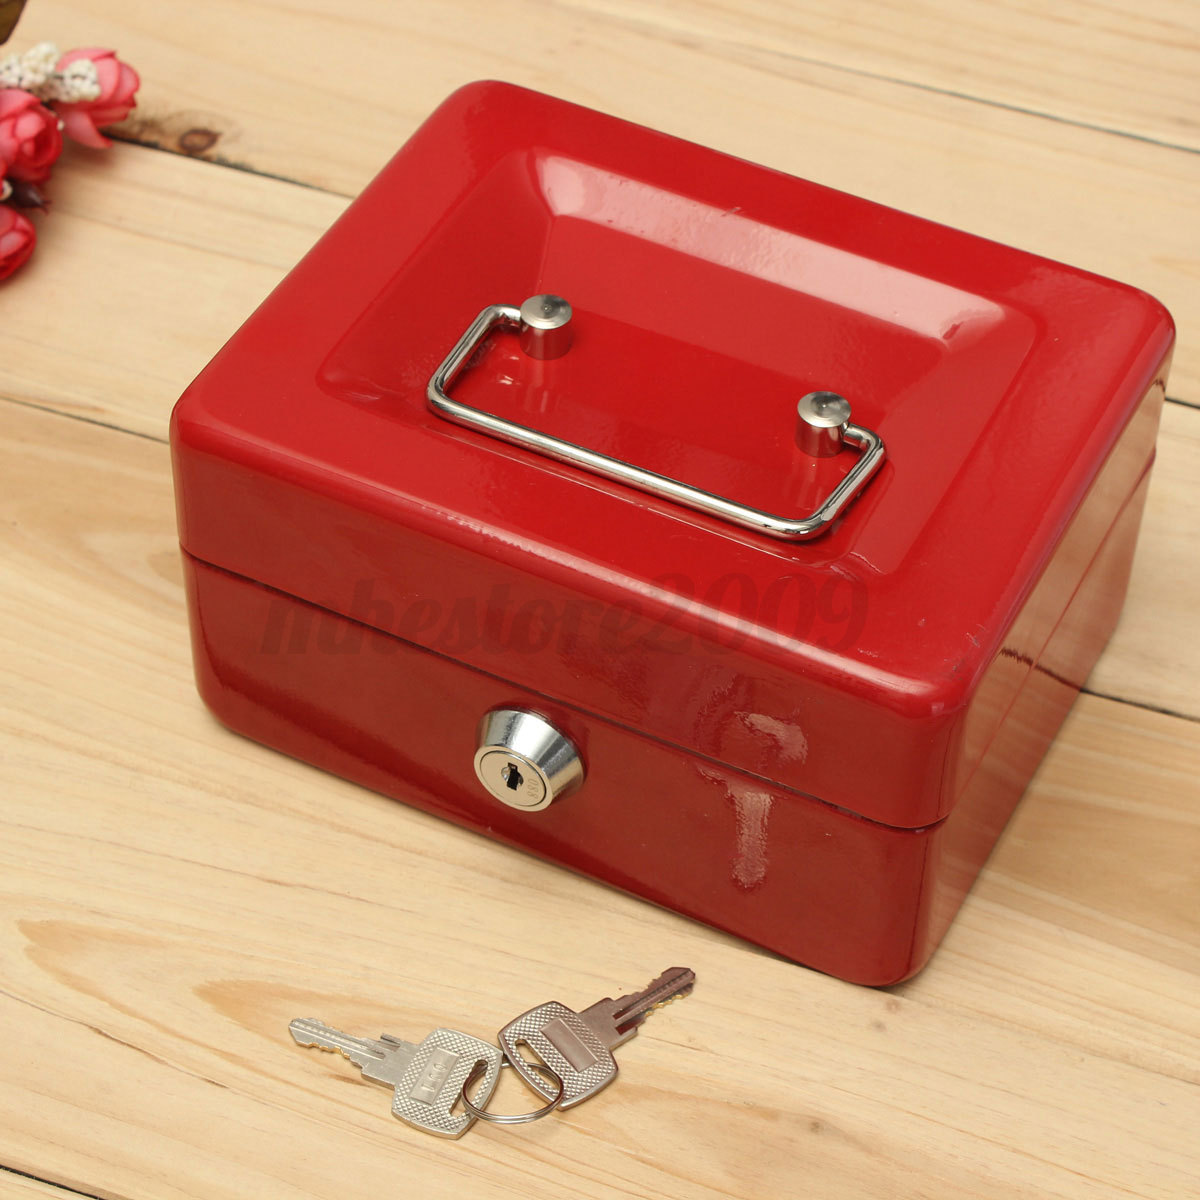 Stainless Steel Tiered Cash Money Box Lock Locking Bank